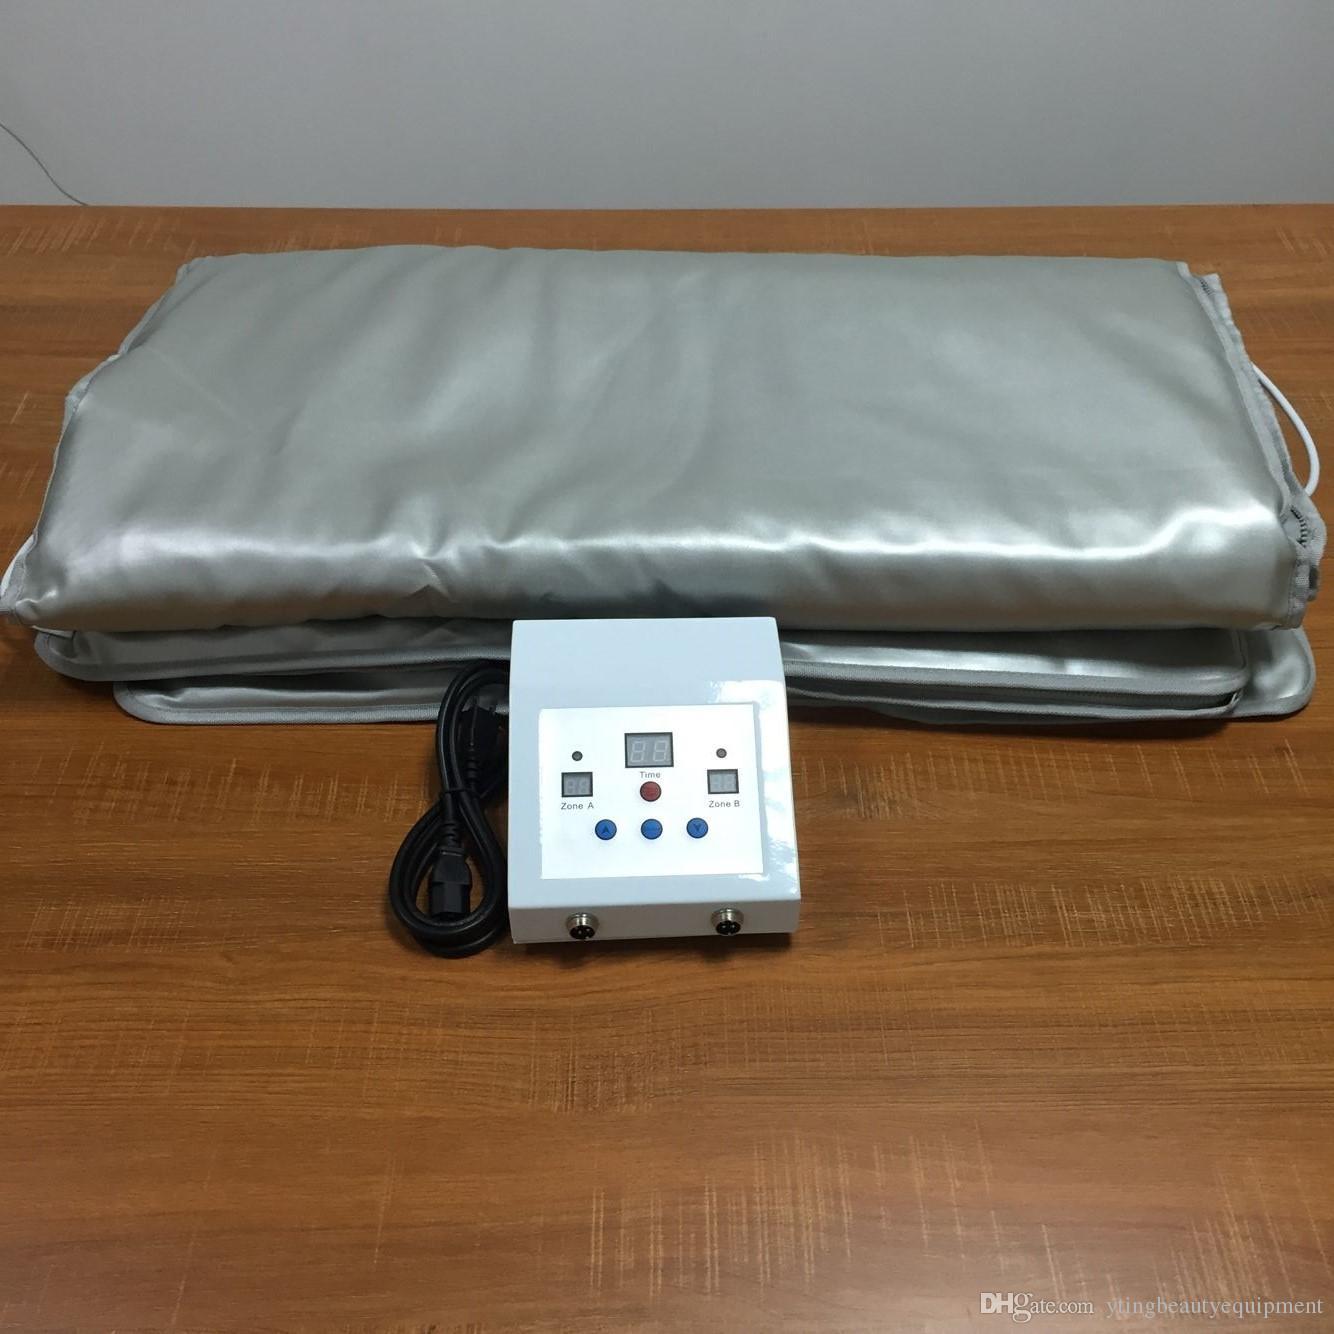 FIR Far Infrared Sauna Blanket Weight Loss Body Slimming Blanket Infrared Ray Heat